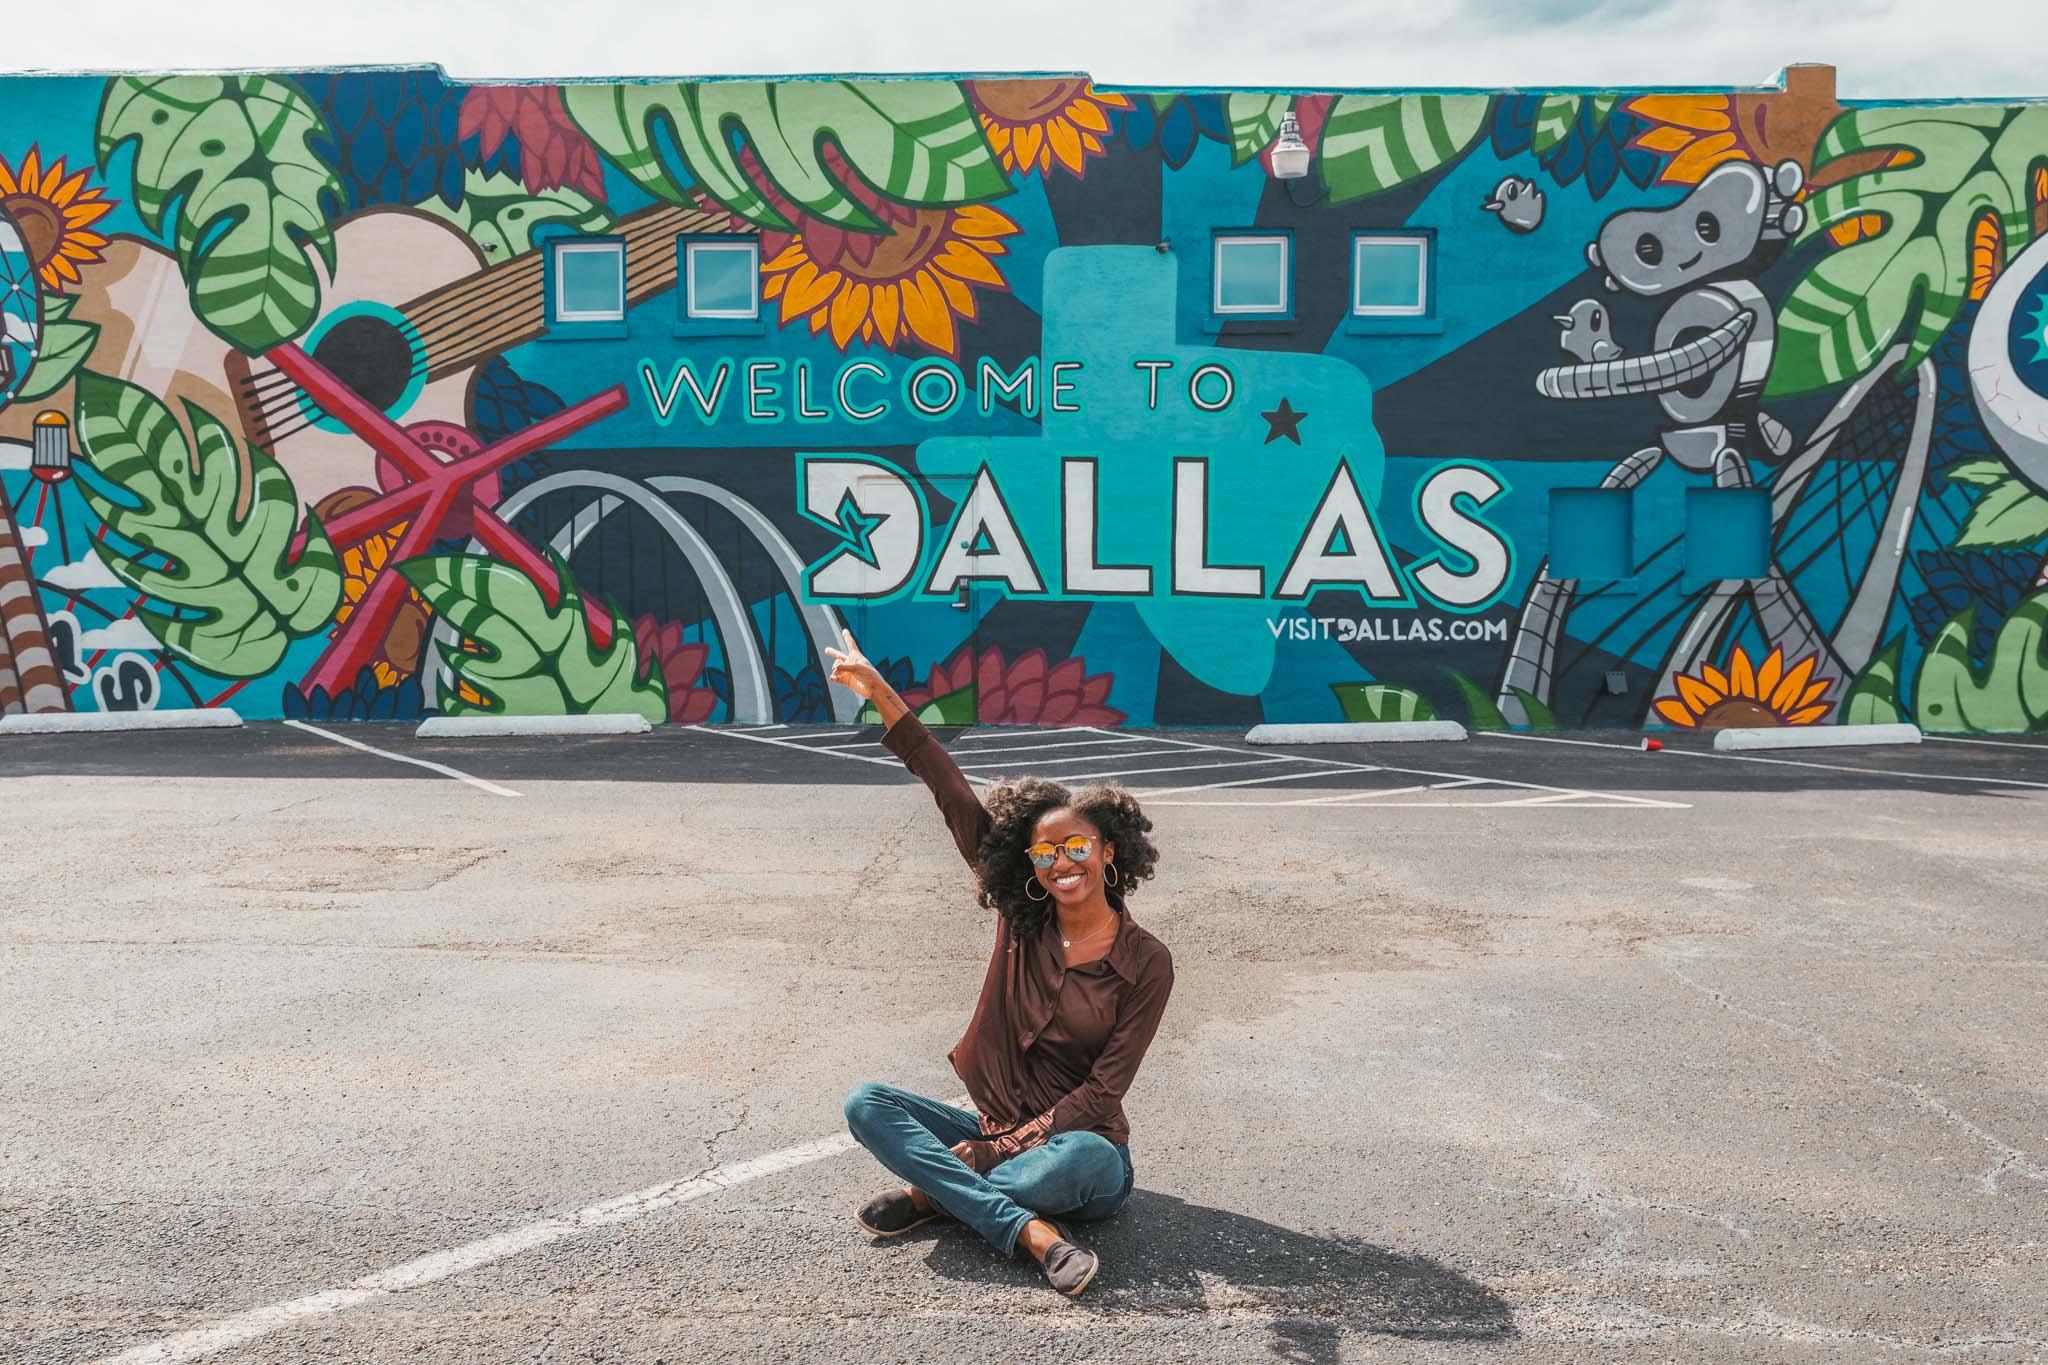 Welcome to Dallas mural in Deep Ellum neighborhood of Dallas, Texas